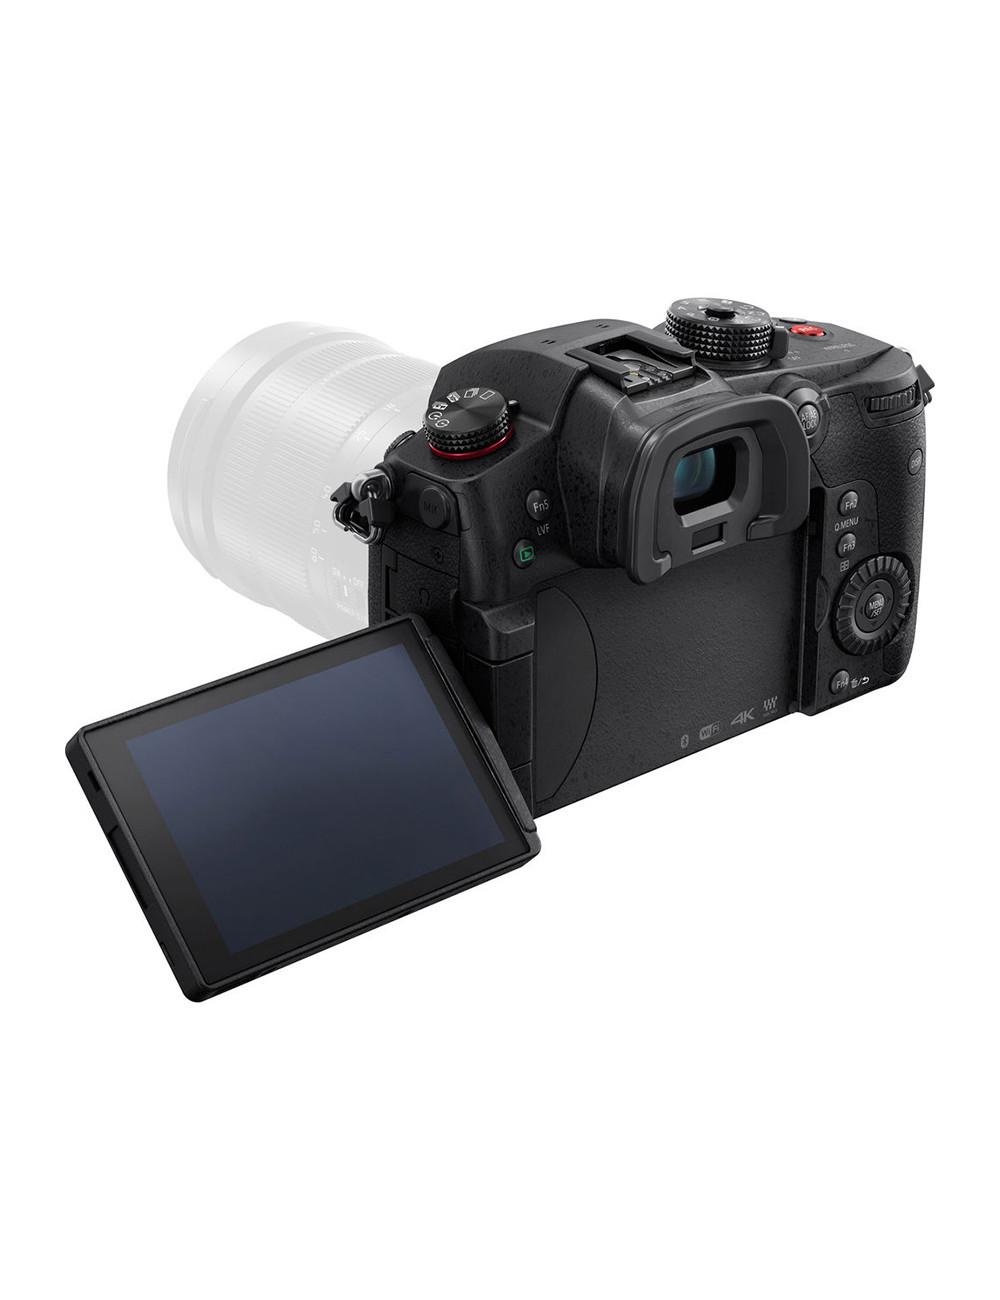 Profoto A1 AirTTL-N Flash Profesional para Cámaras Nikon